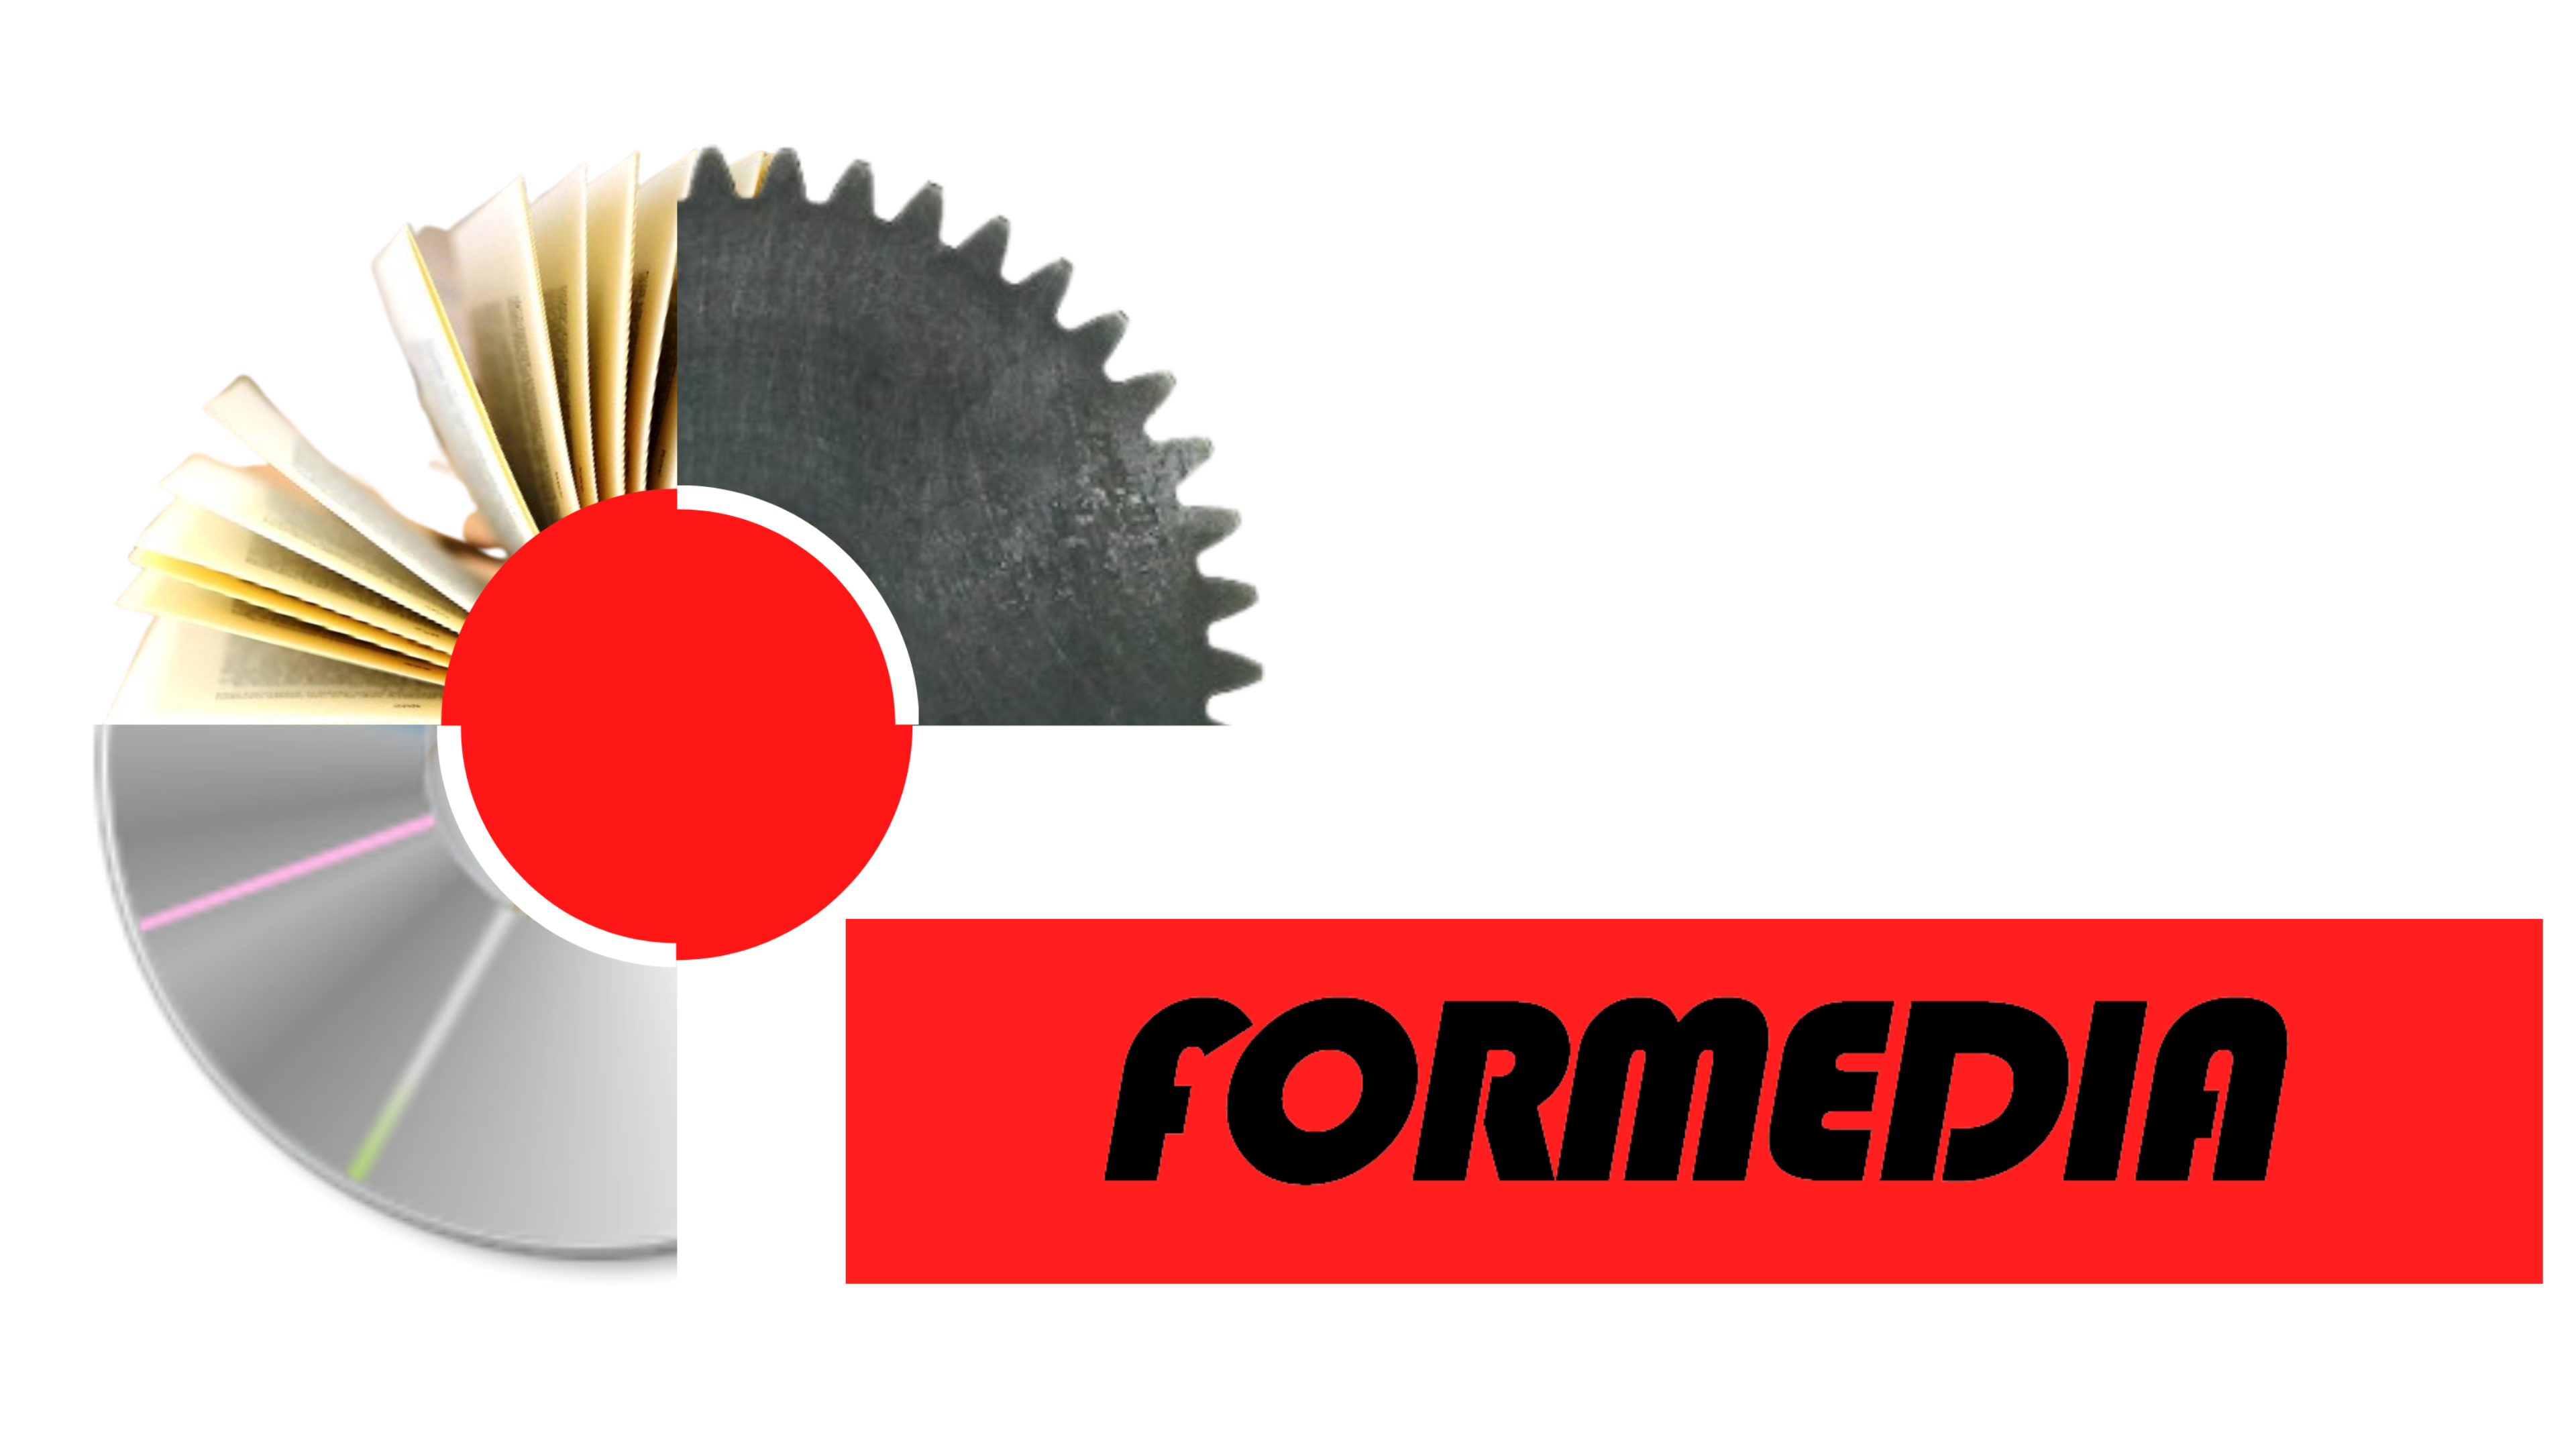 Formedia Online